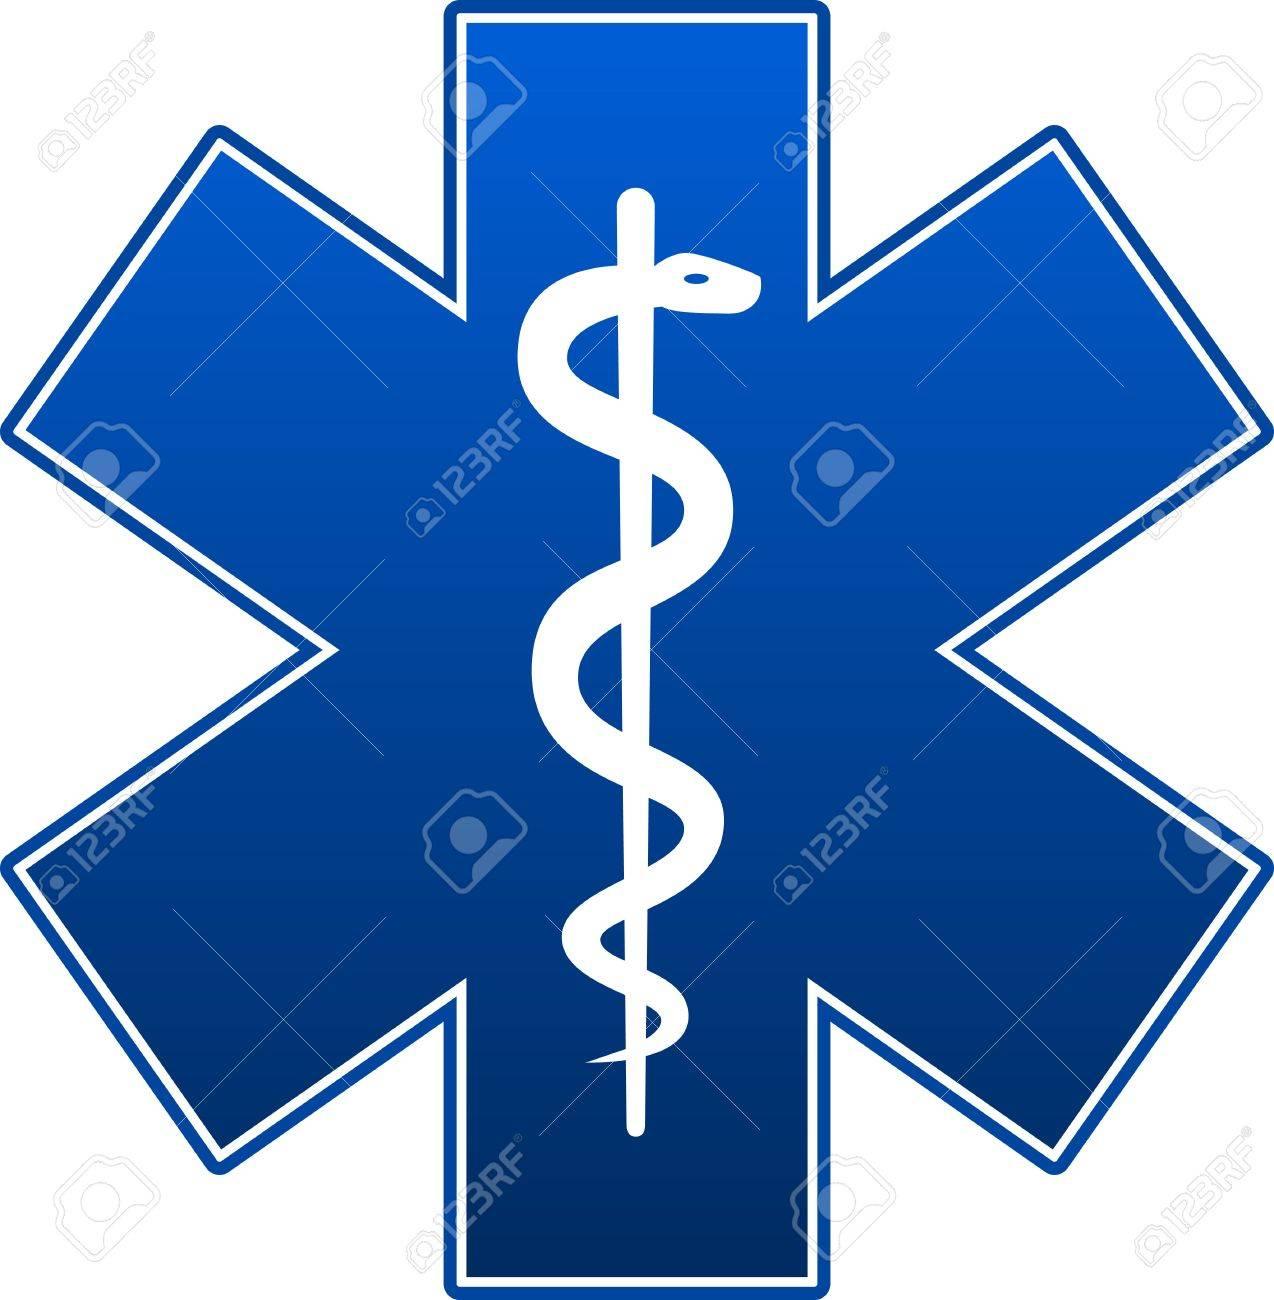 Emergency star blue on white background. - 14983965